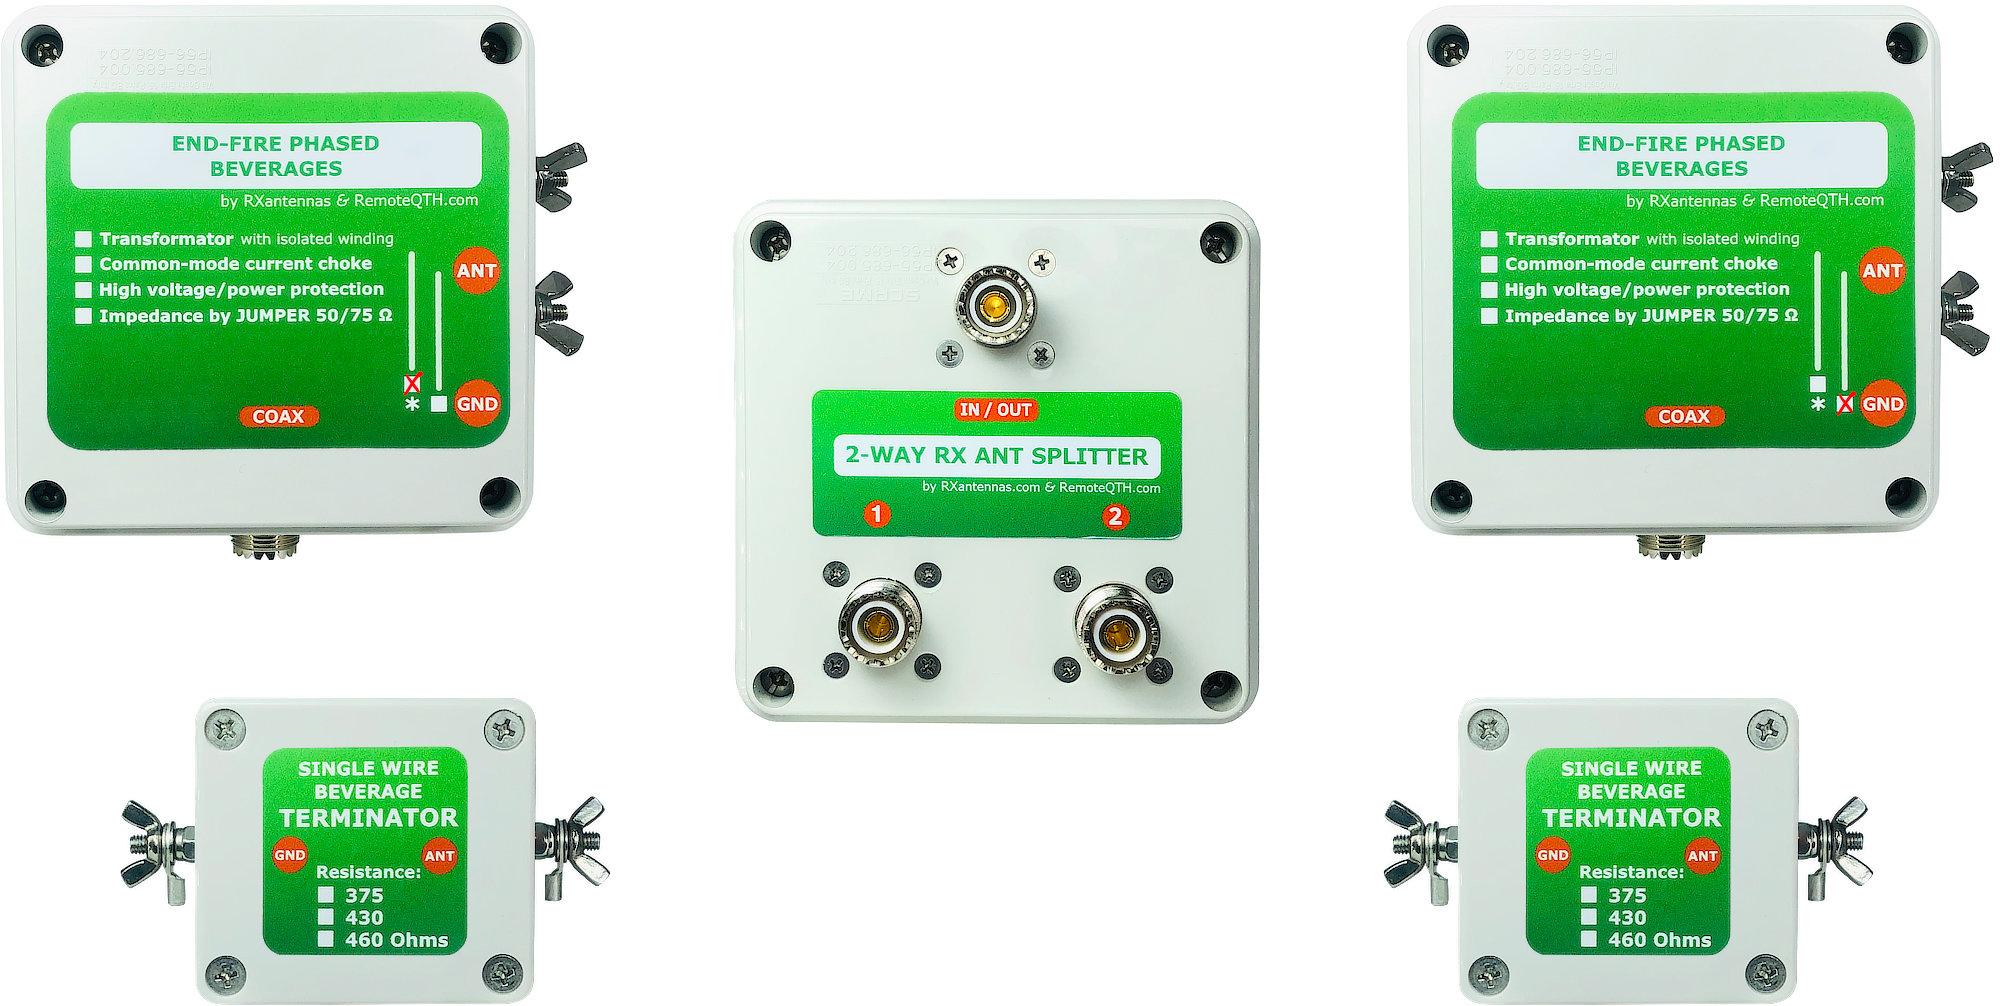 2el end-fire beverage antenna array by qro.cz hamparts.shop